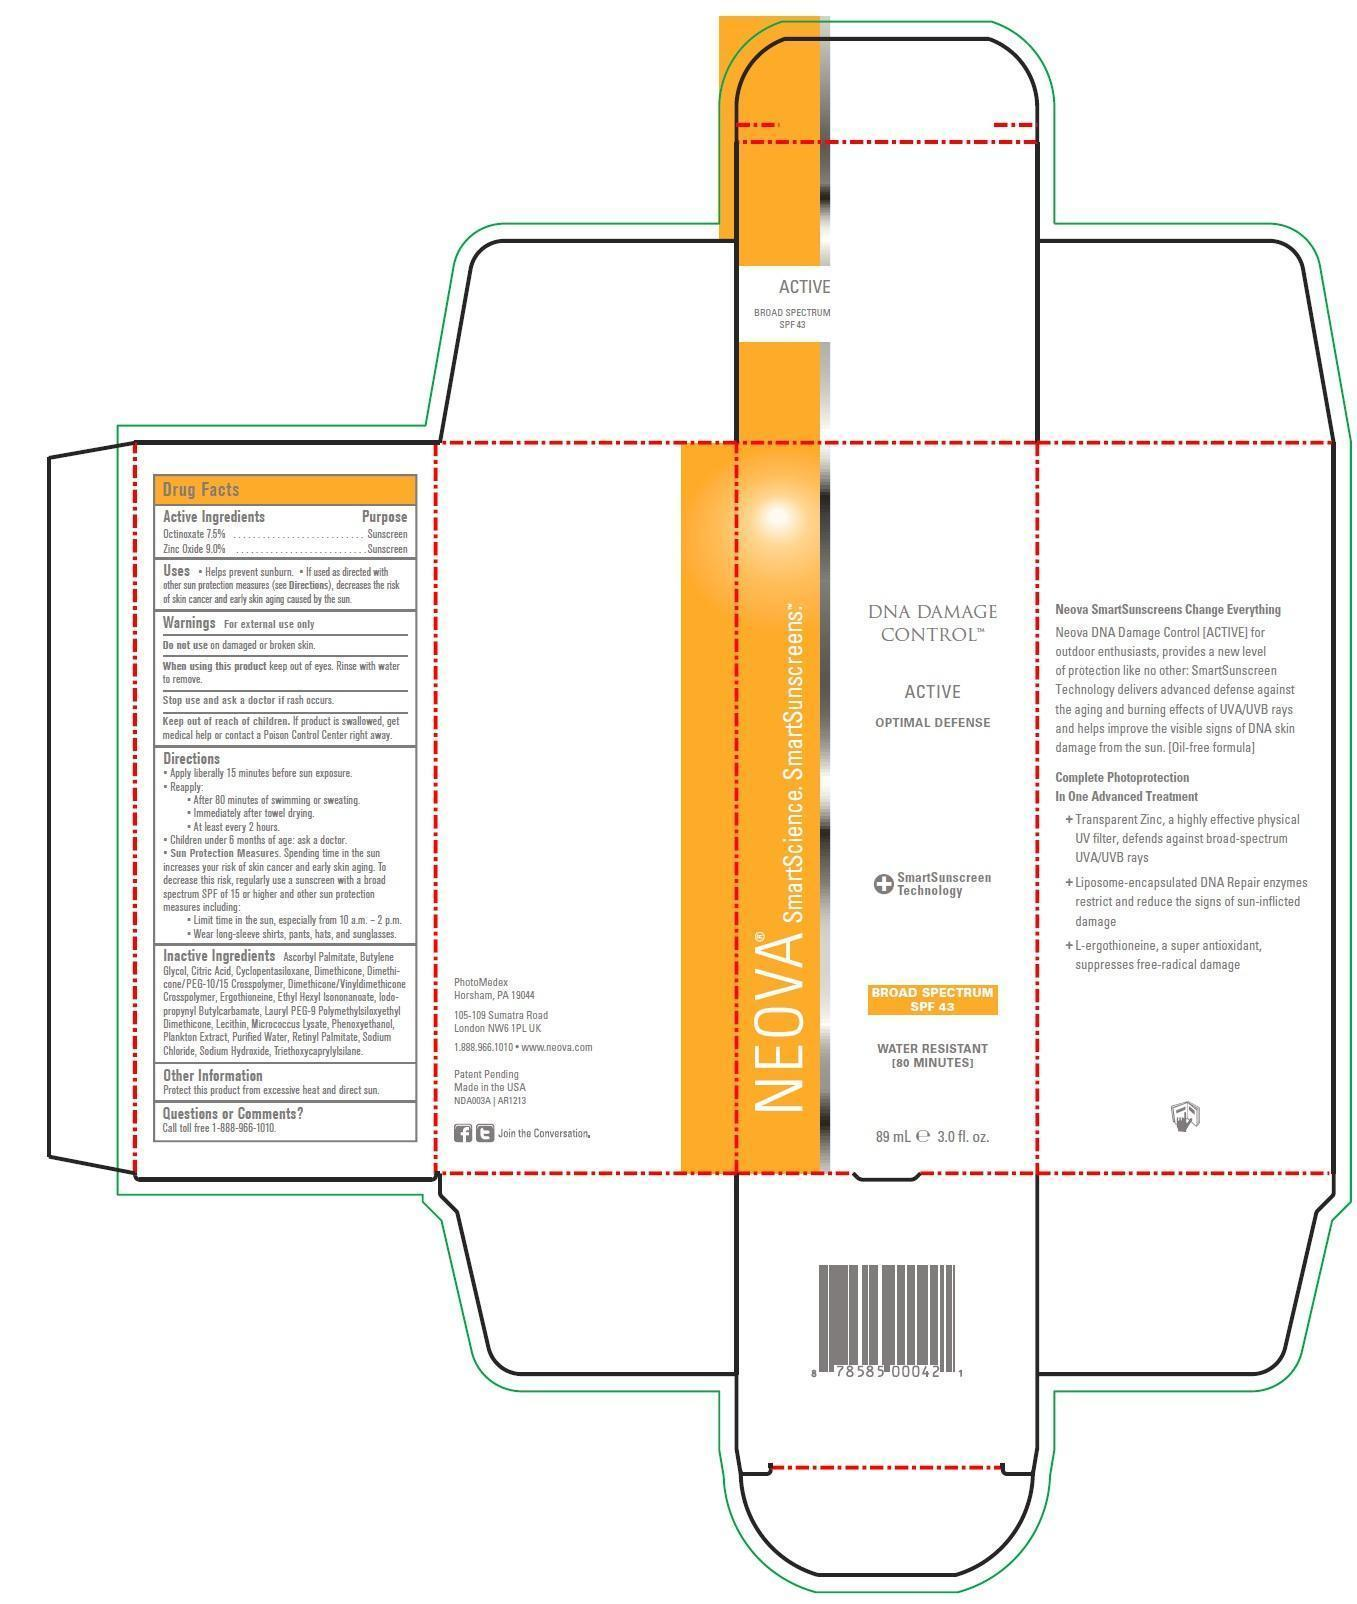 Neova Dna Damage Control – Active Broad Spectrum Spf 43 (Octinoxate, Zinc Oxide) Emulsion [Photomedex, Inc.]